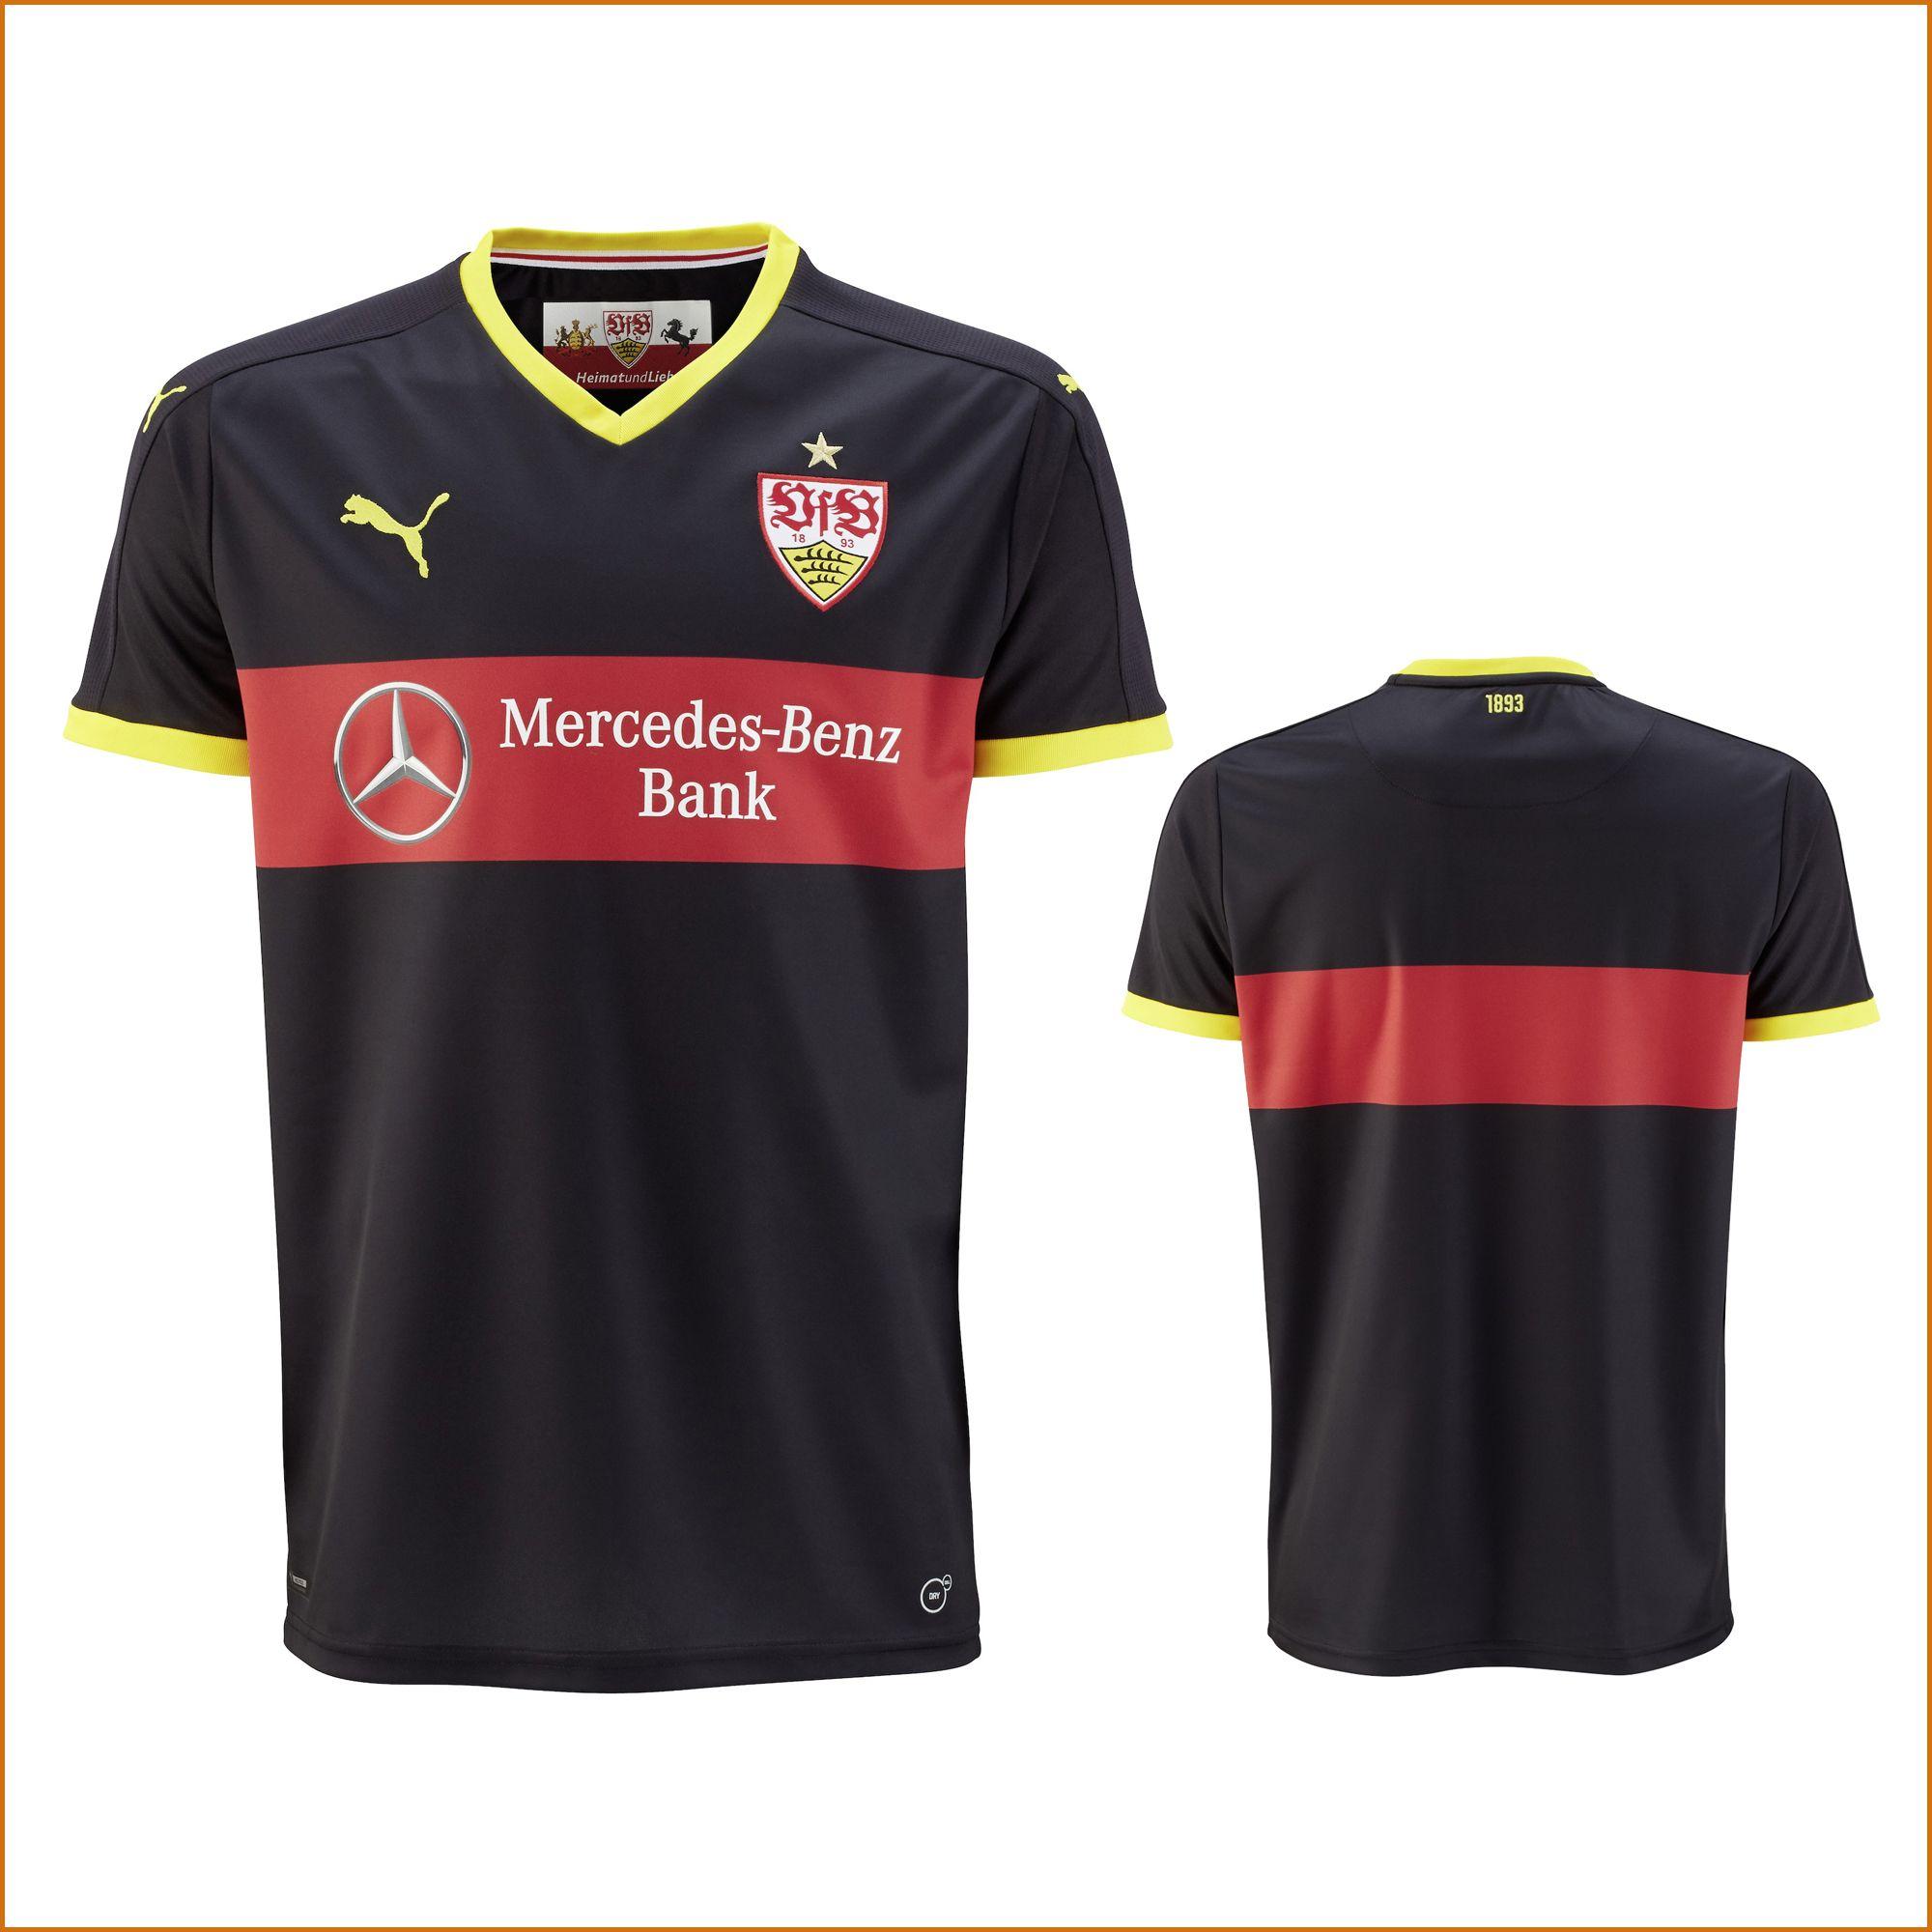 Vfb stuttgart ausweich trikot schwarz rot bundesliga for Bundesliga trikots